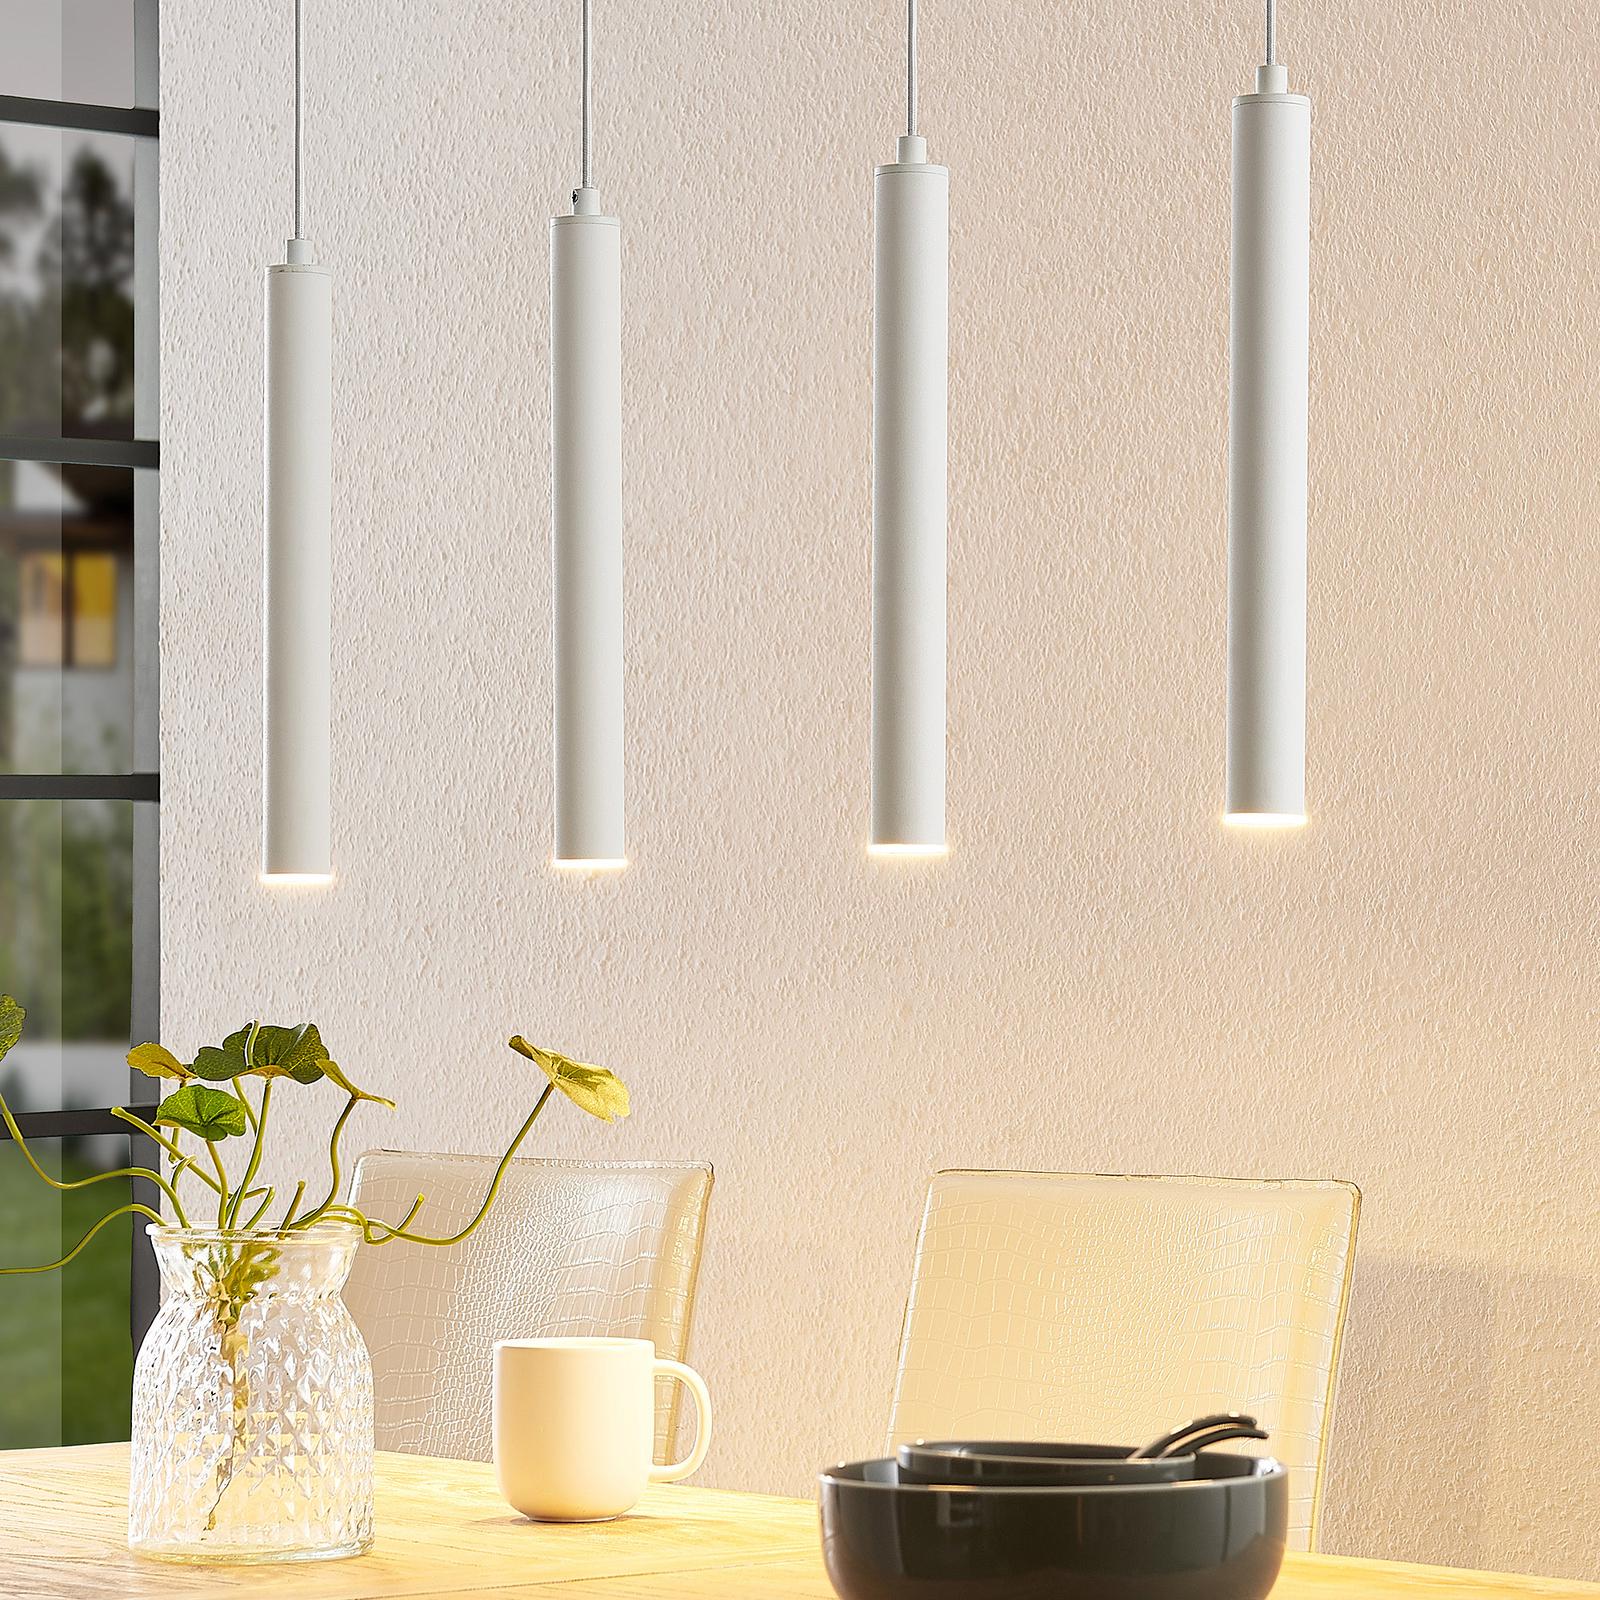 Arcchio Kammeron lámpara colgante LED, blanca